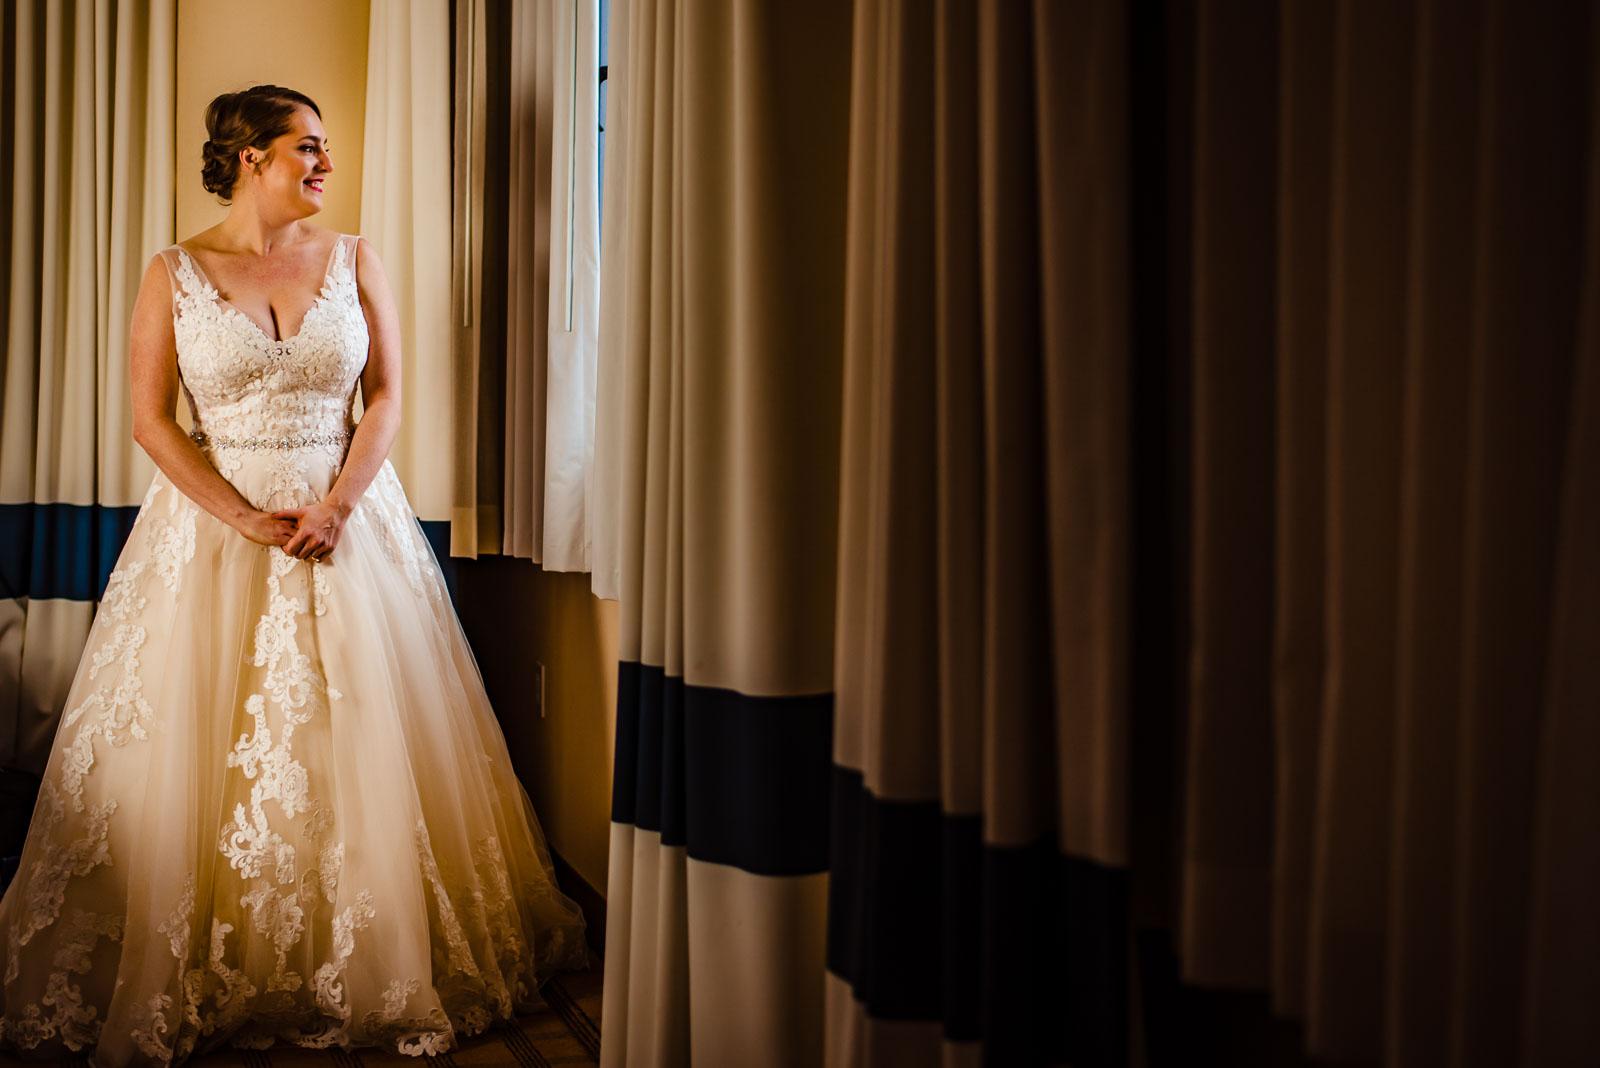 Bride portrait in hotel